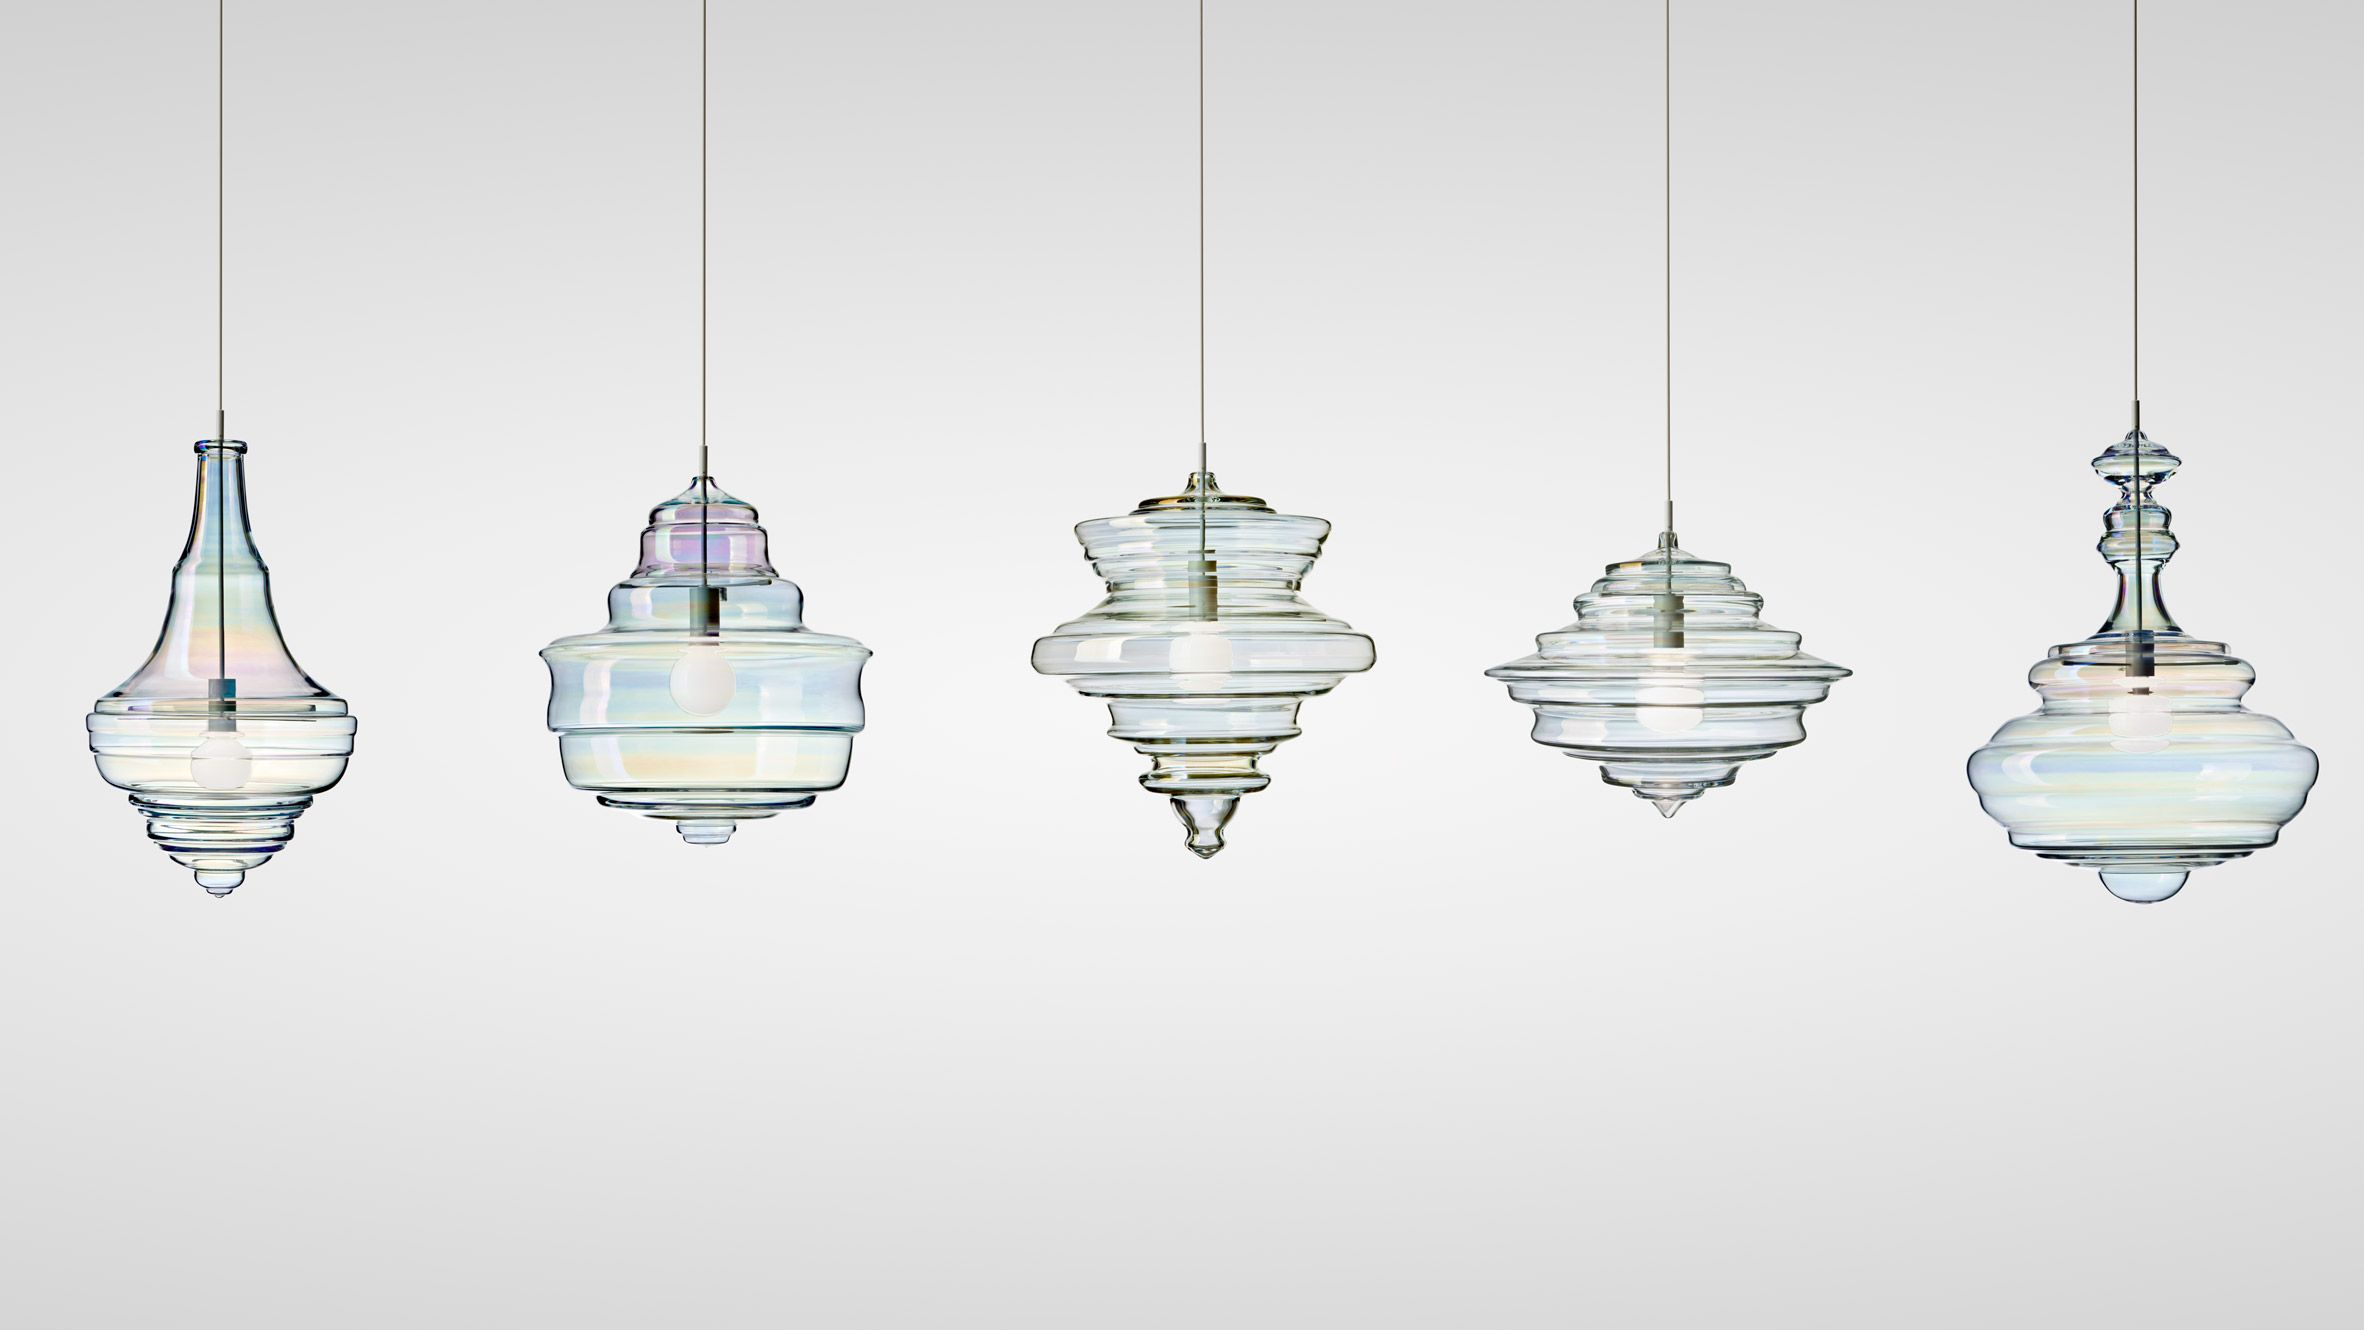 Lasvit creates minimalist versions of traditional bohemia lasvit creates minimalist versions of traditional bohemia chandeliers arubaitofo Gallery